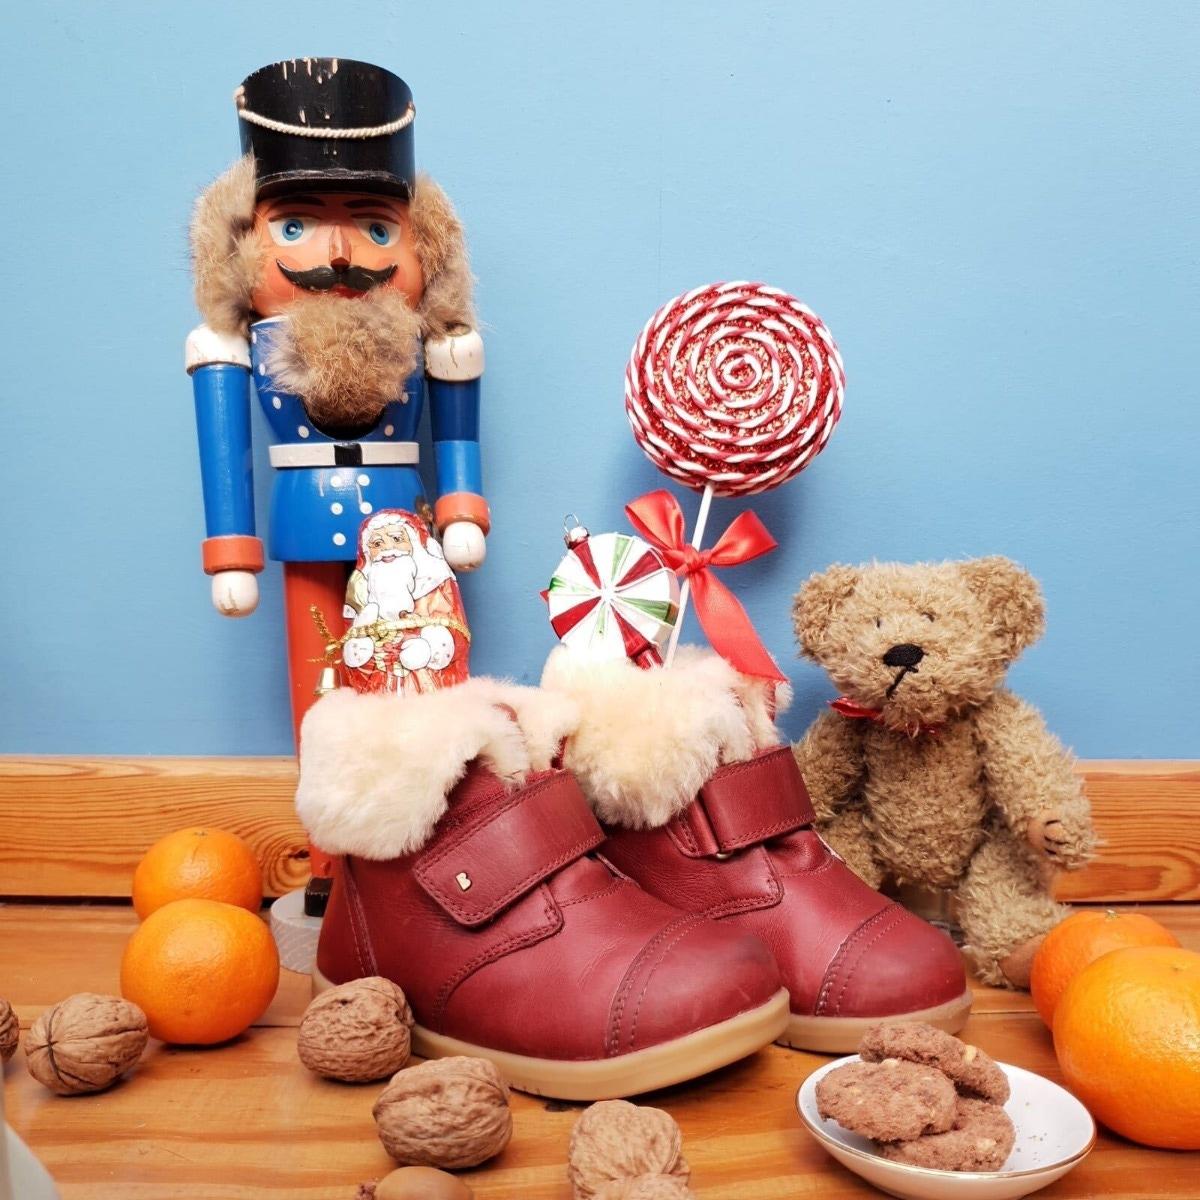 Nikolaus toddler shoes St Nicholas Day